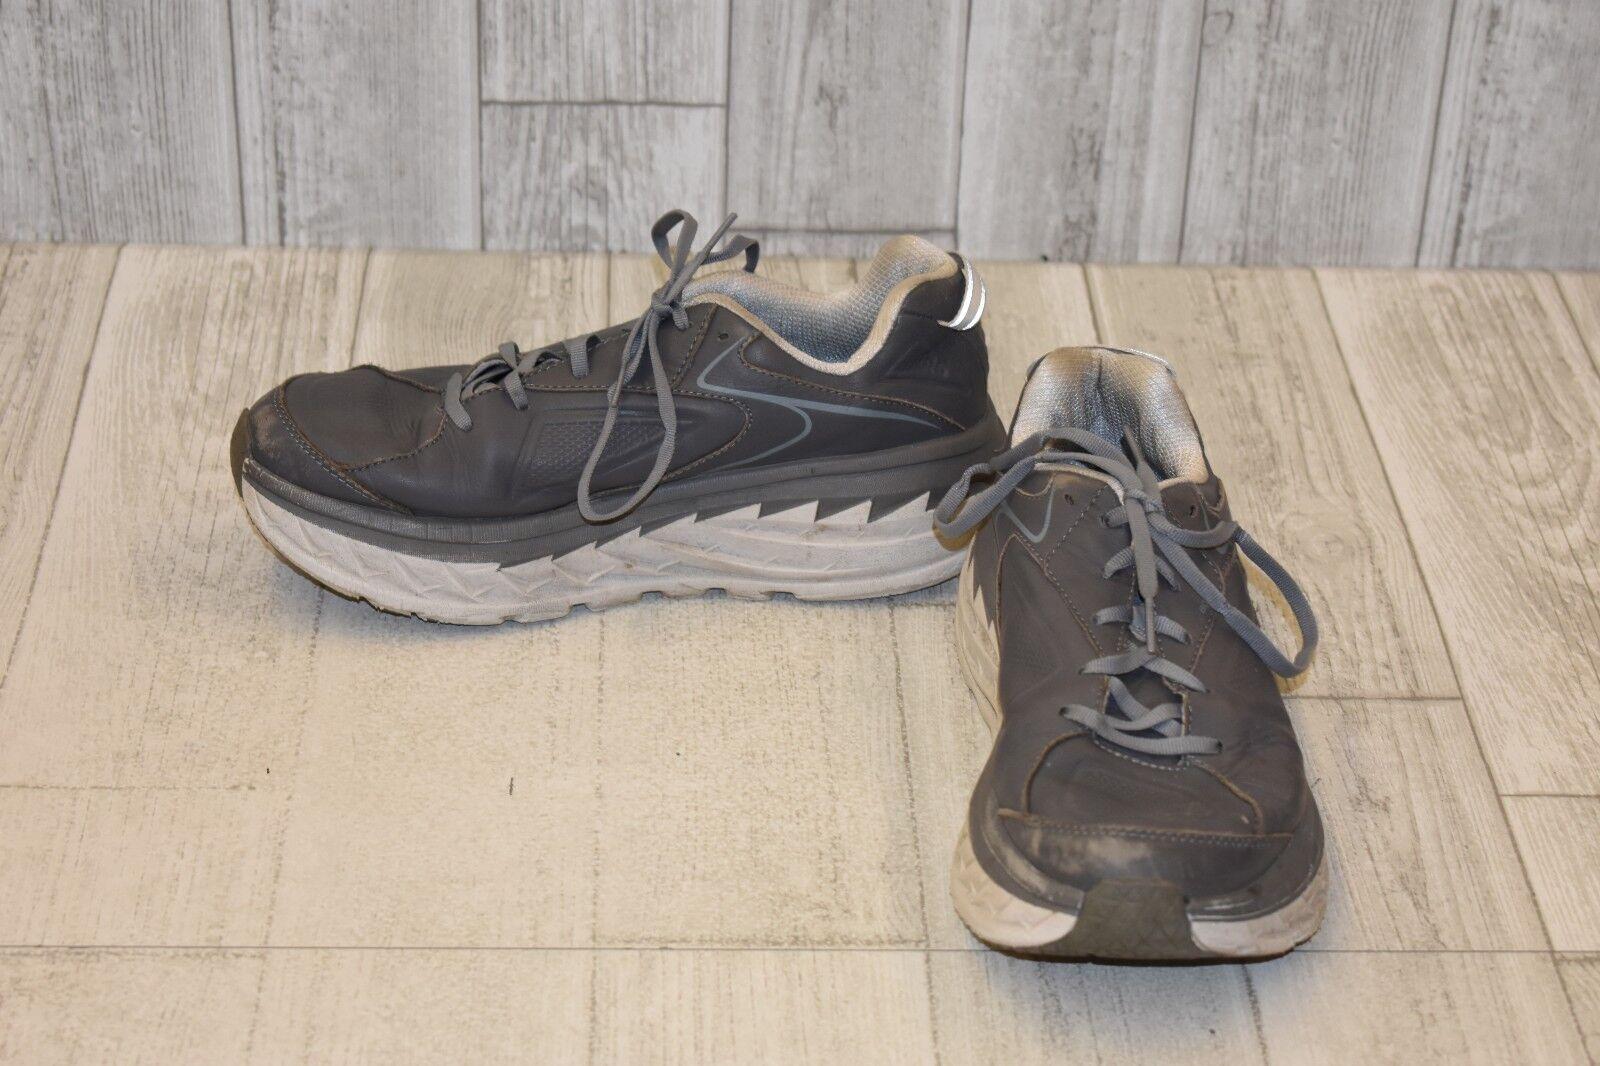 Hoka One One Bondi LTR Running SHoes, Men's Size 9, Grey